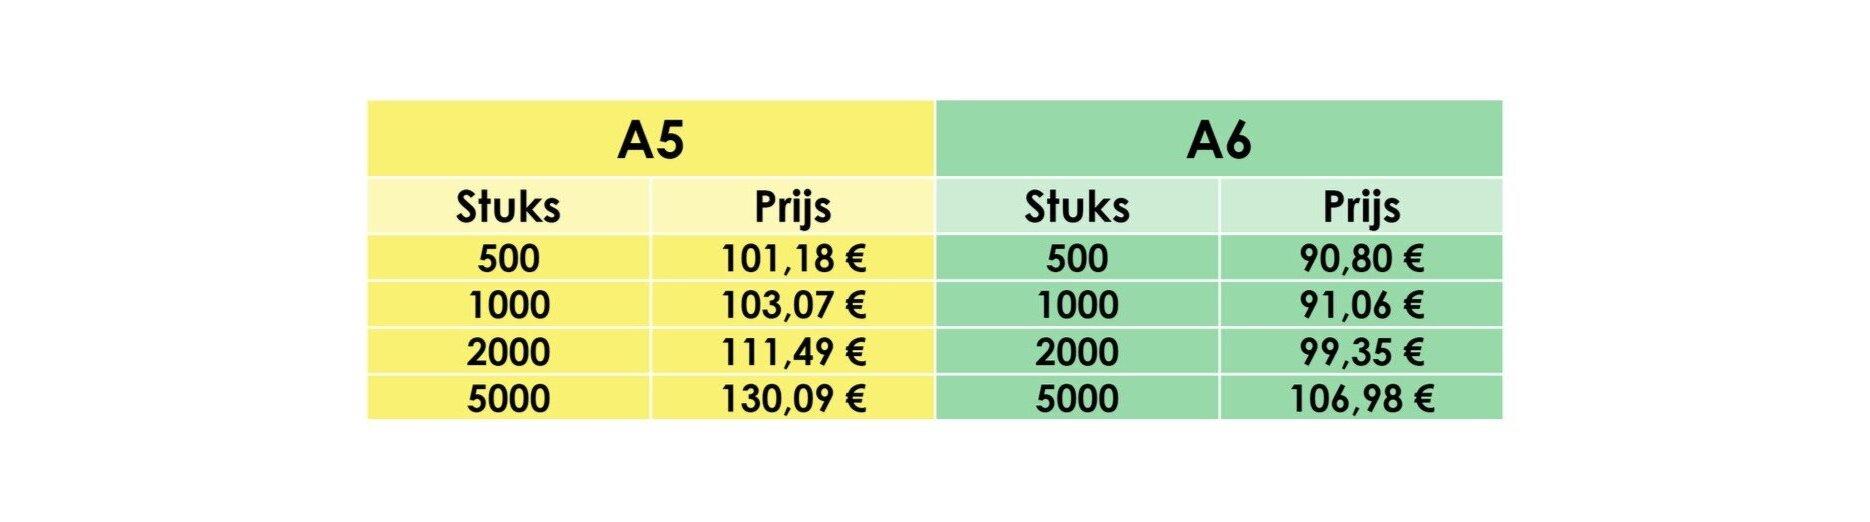 Prijzen%2BWebhop_Flyers_27%2B09%2B2019.jpg